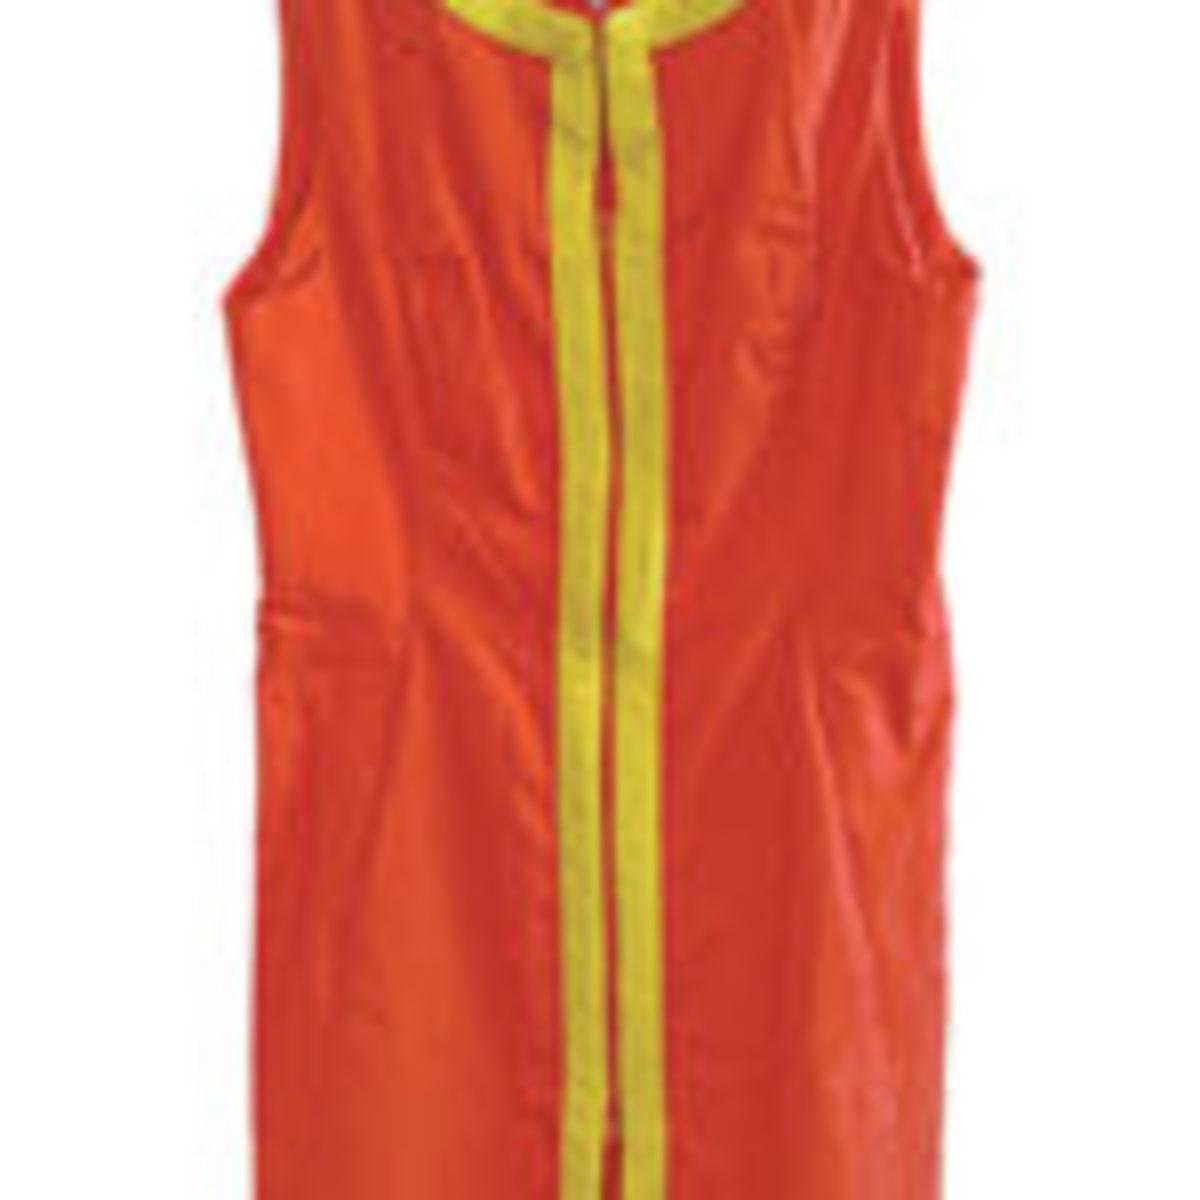 Flight attendant's dress.